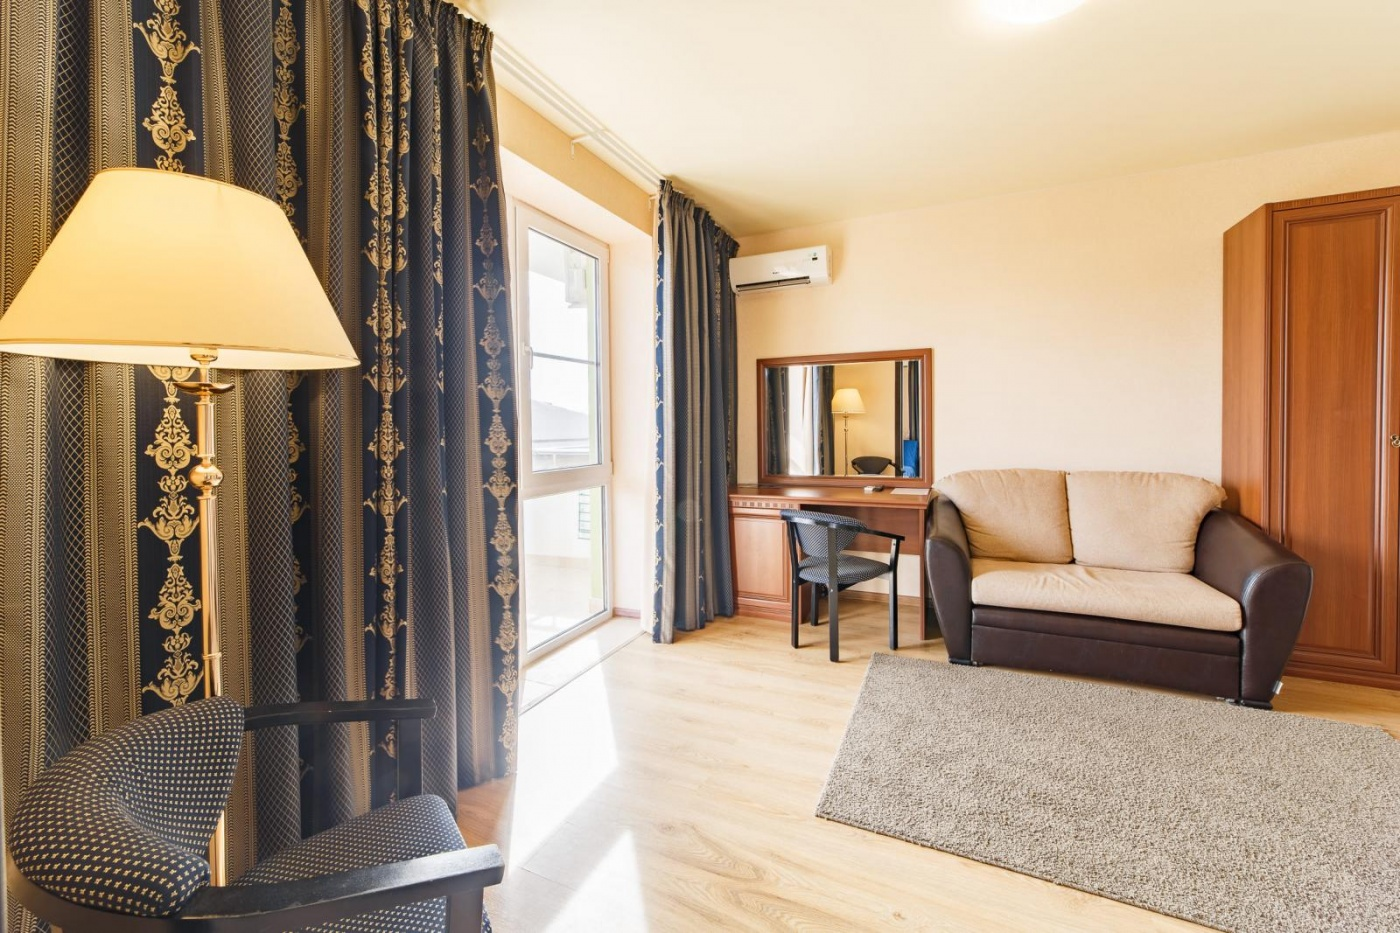 Отель «Relax» Краснодарский край Lux 2-комнатный, фото 4